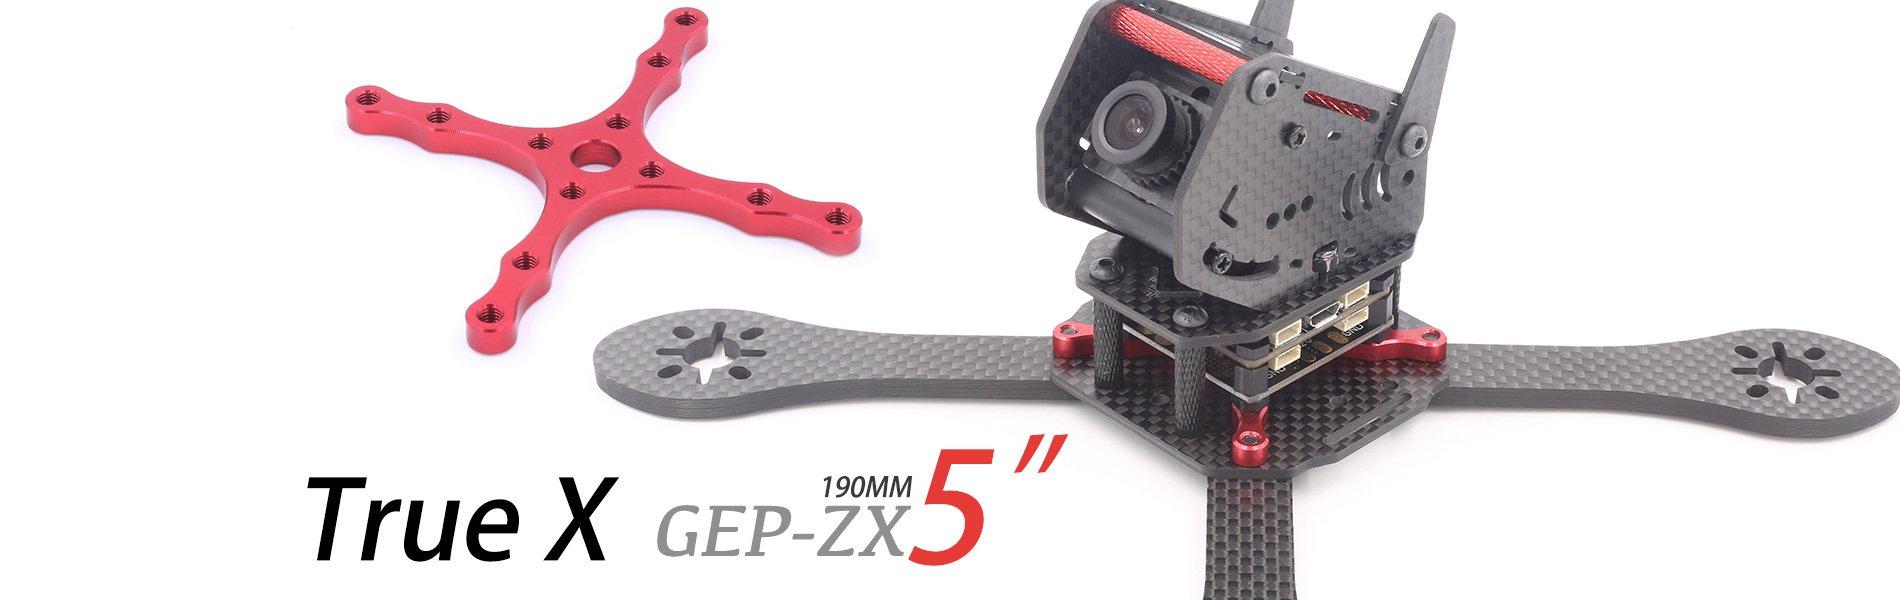 GEP-ZX_post